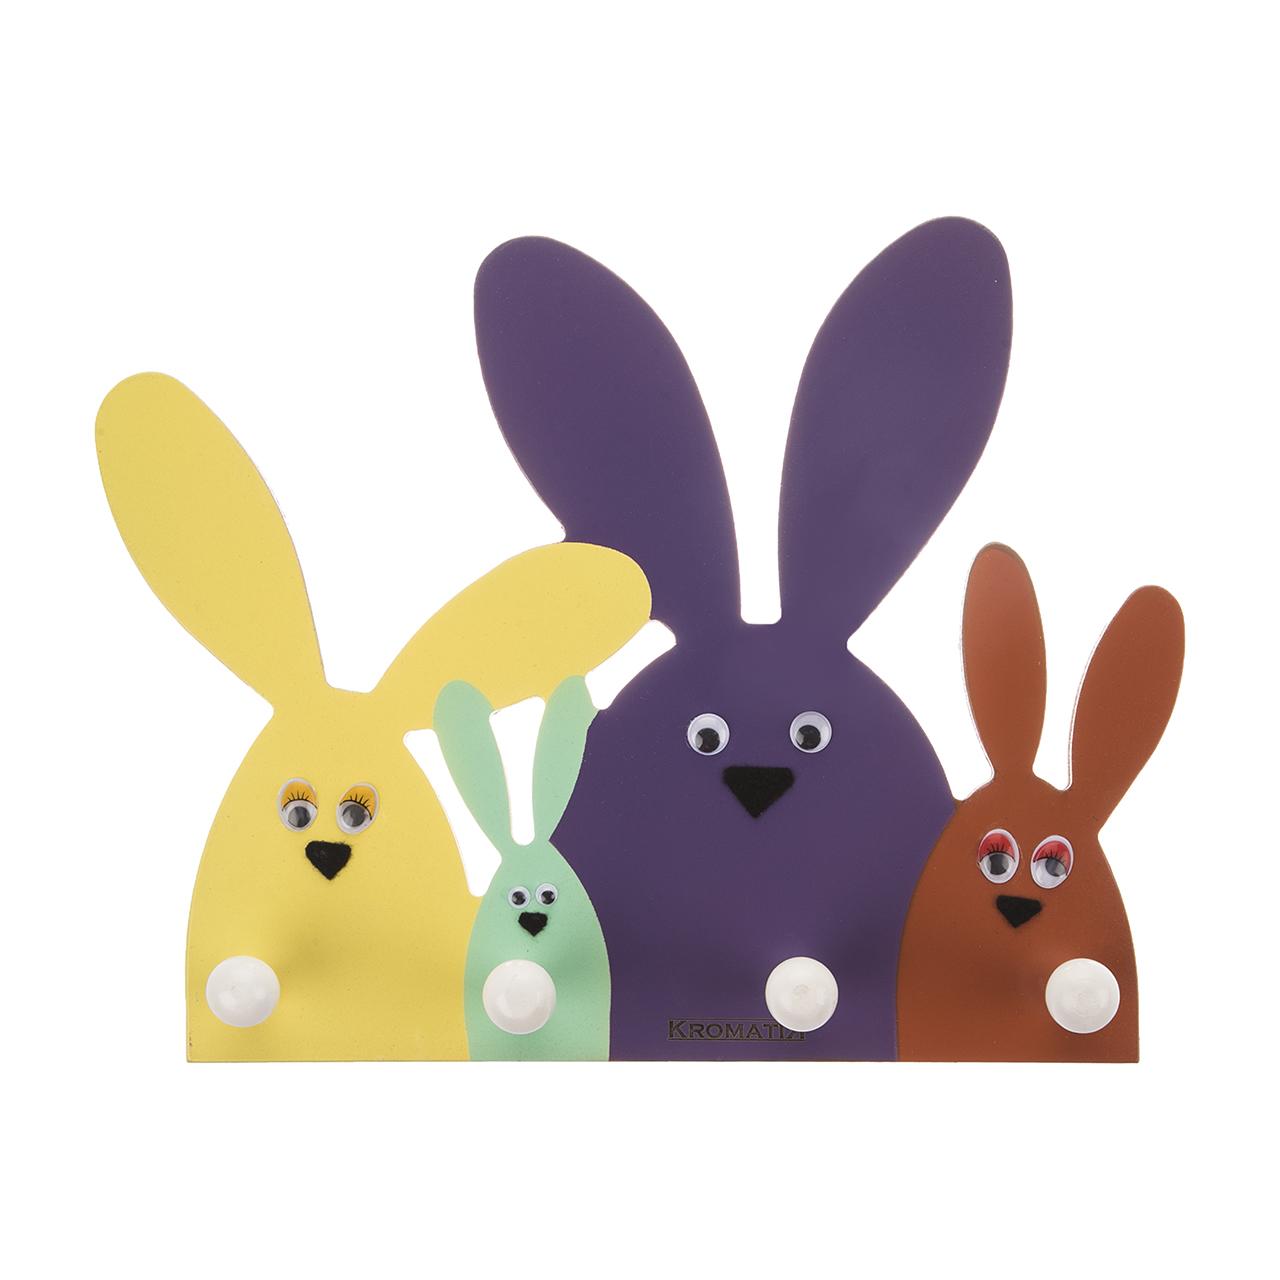 آویز لباس کروماتیک طرح خرگوش مدل KH-R